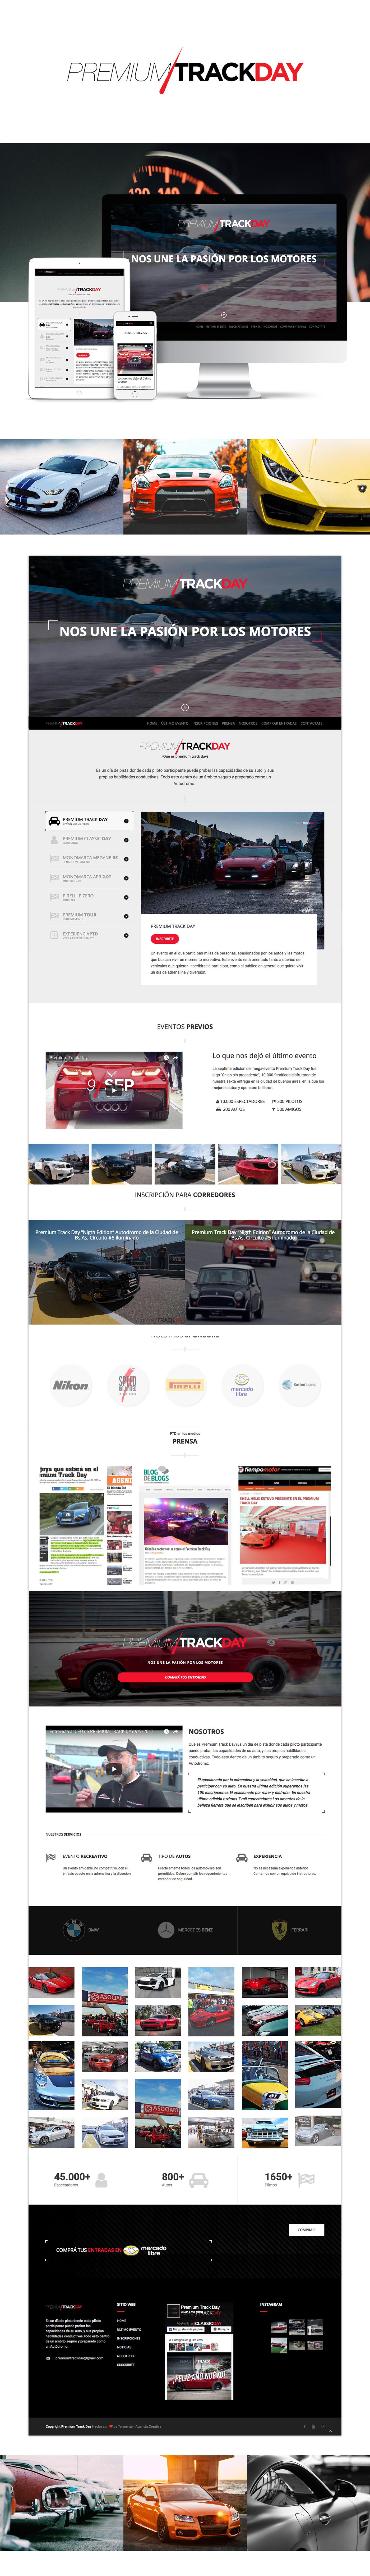 Web Respondive desgn ux Cars premium Day Event mobile diseño